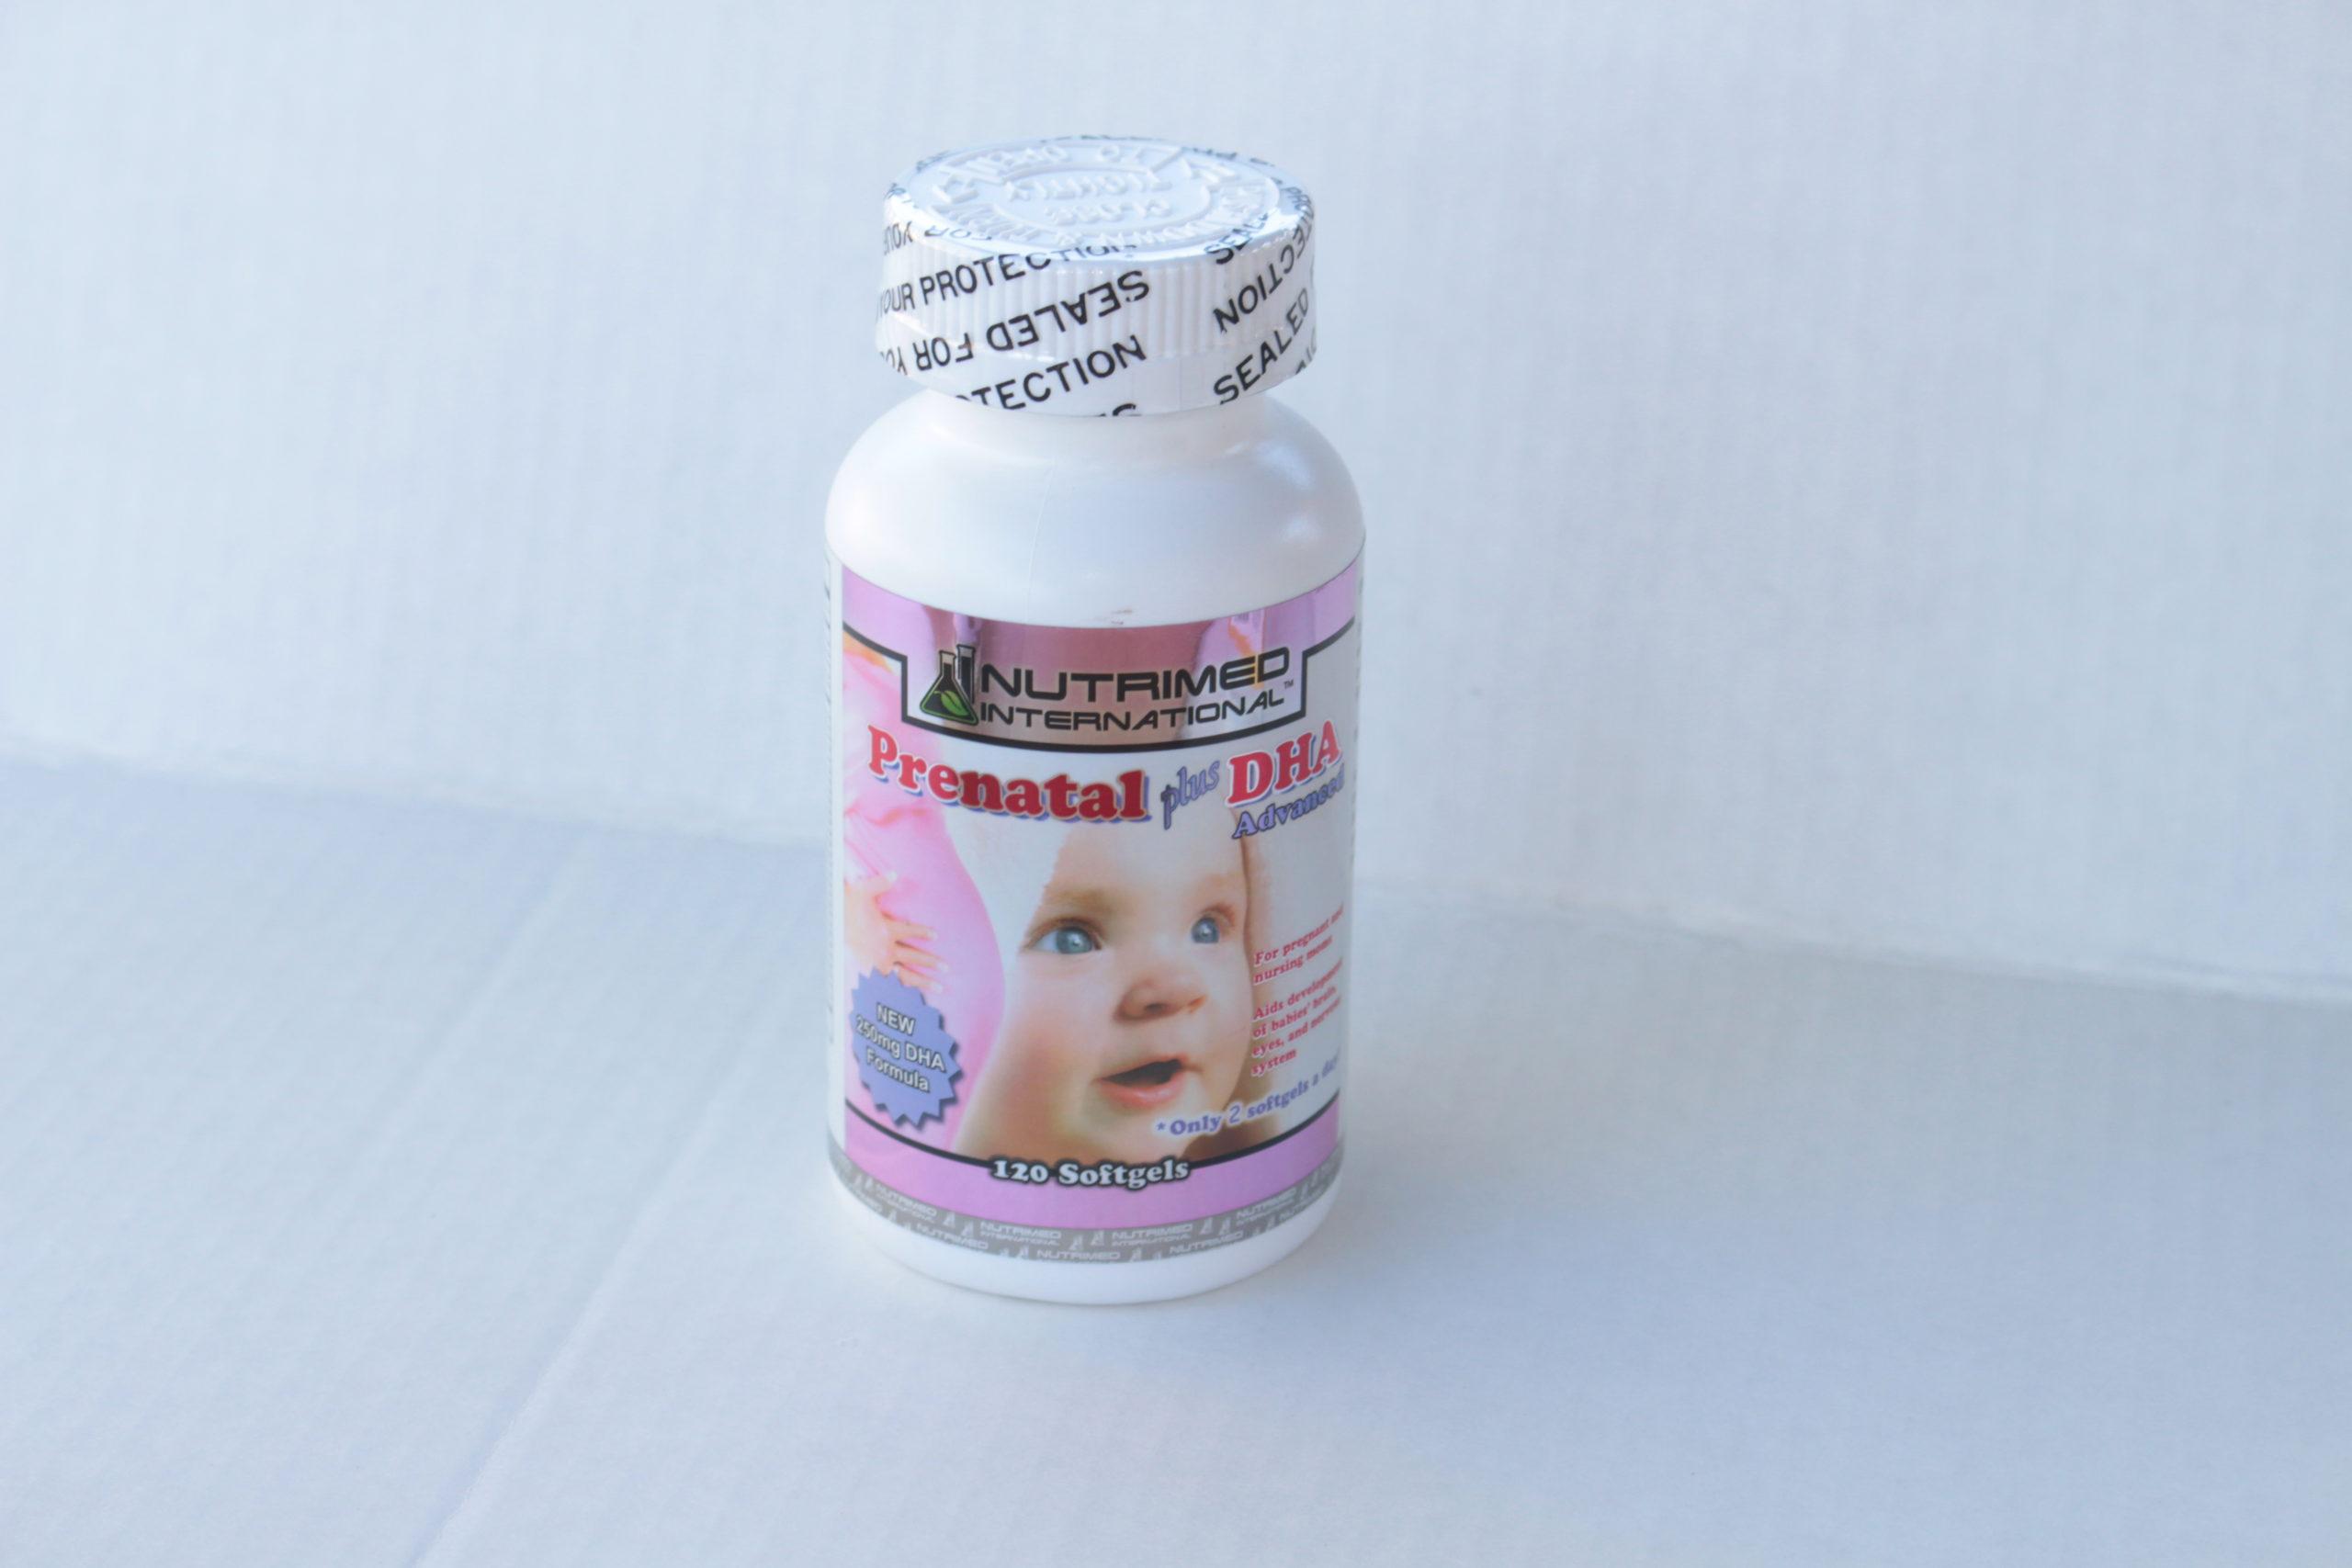 Prenatal plus DNA Advanced